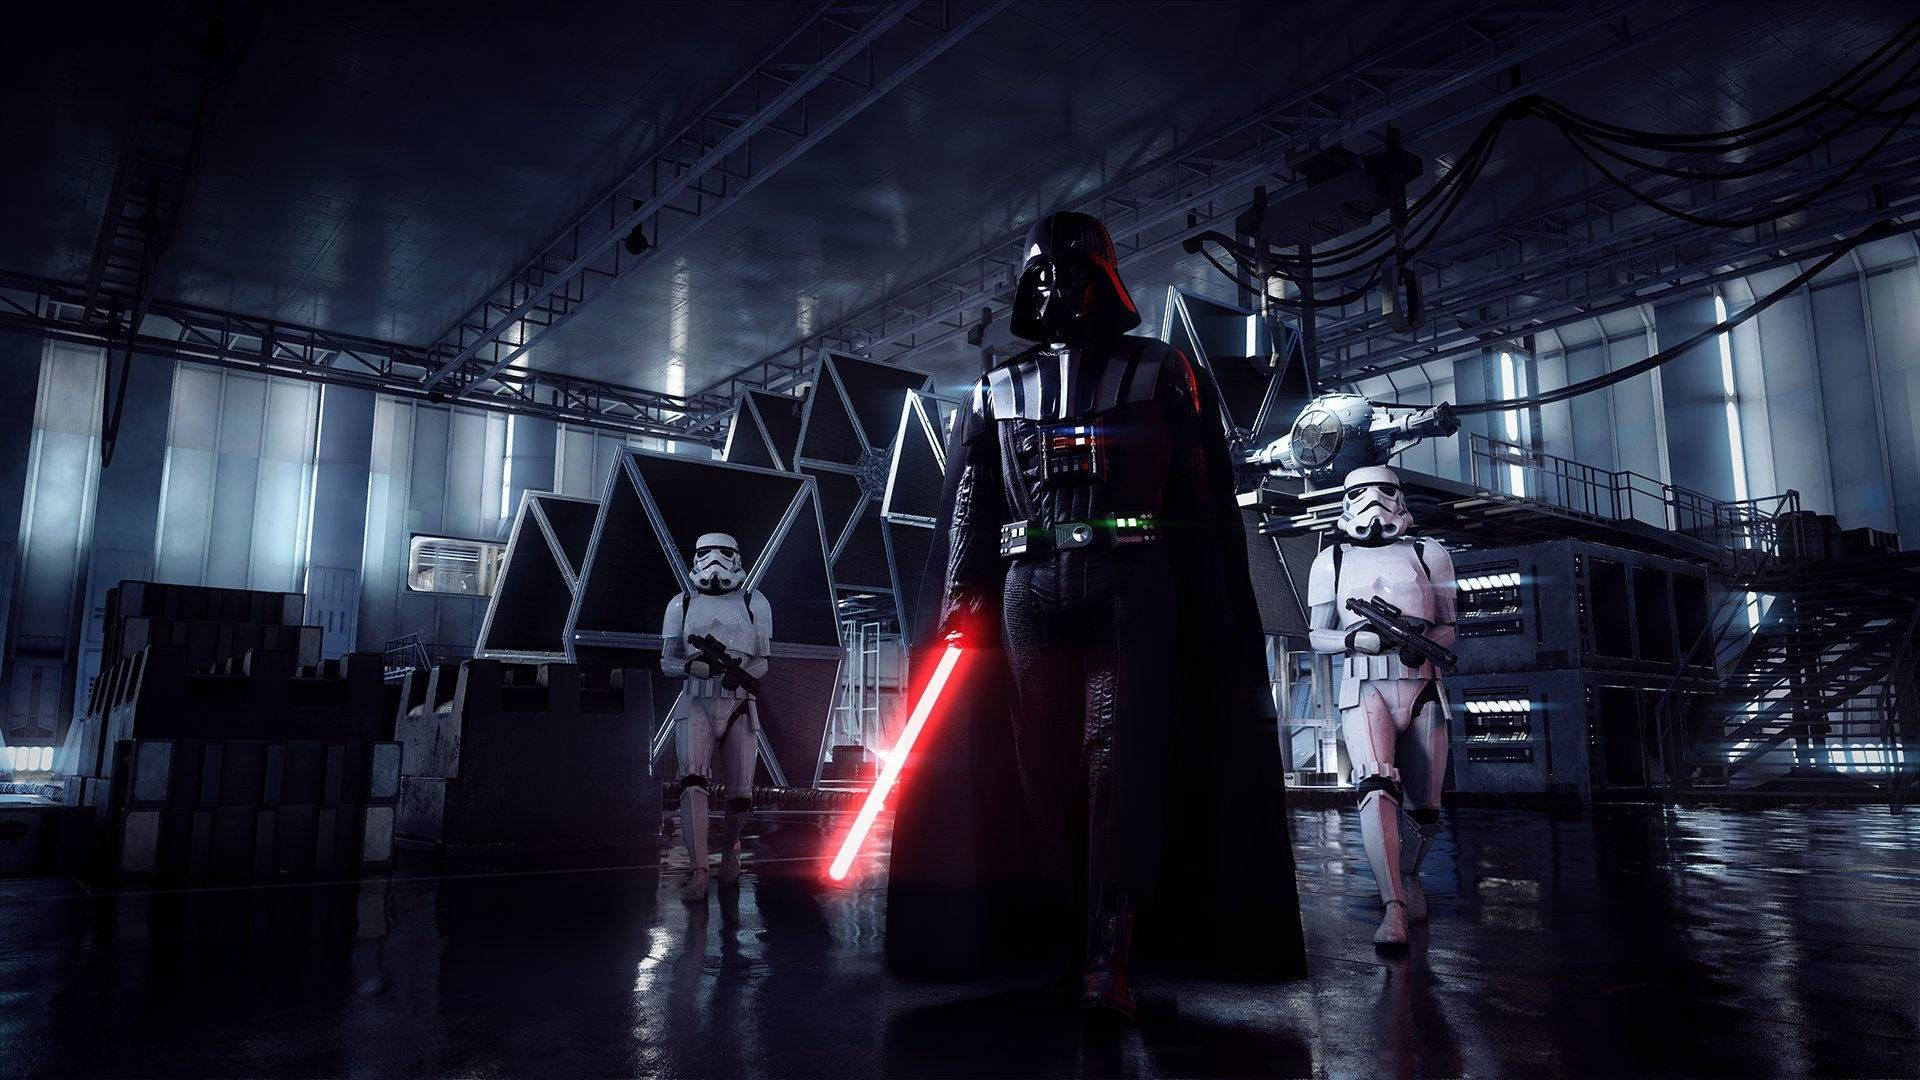 Darth Vader Wallpaper 4k Posted By Michelle Walker